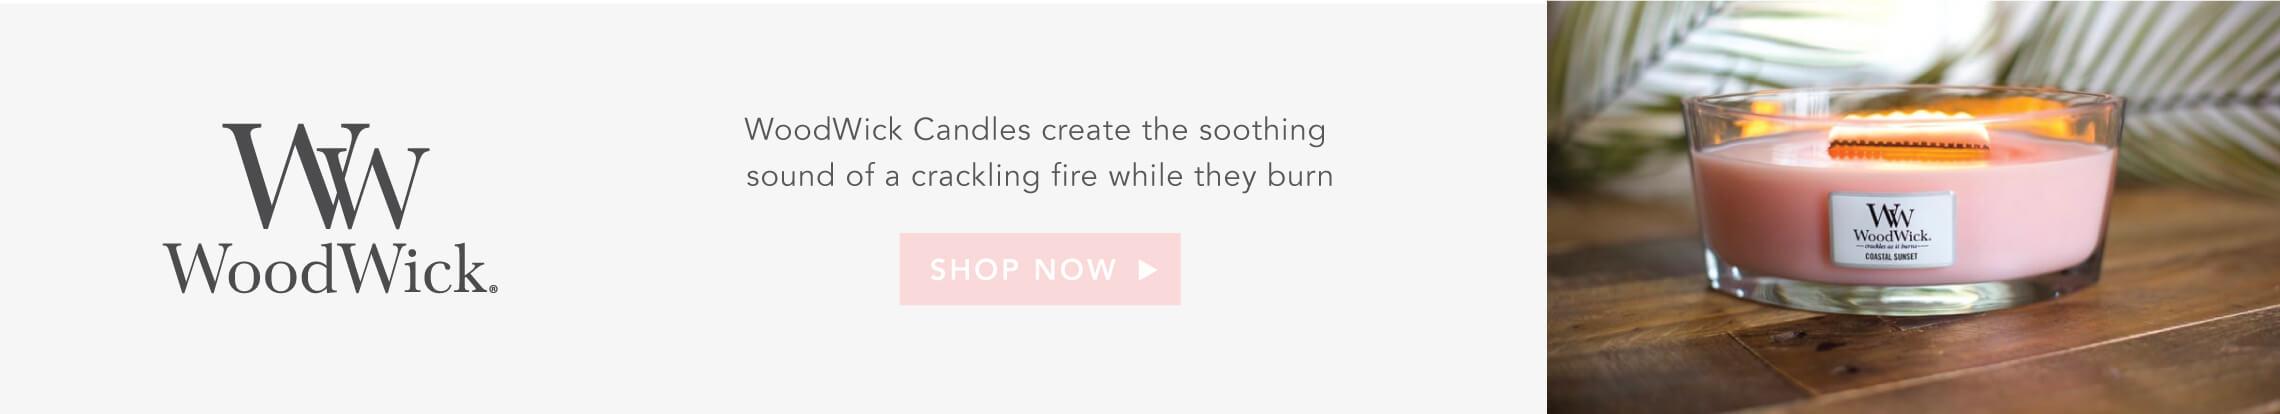 Unique wooden wick that crackles as it burns